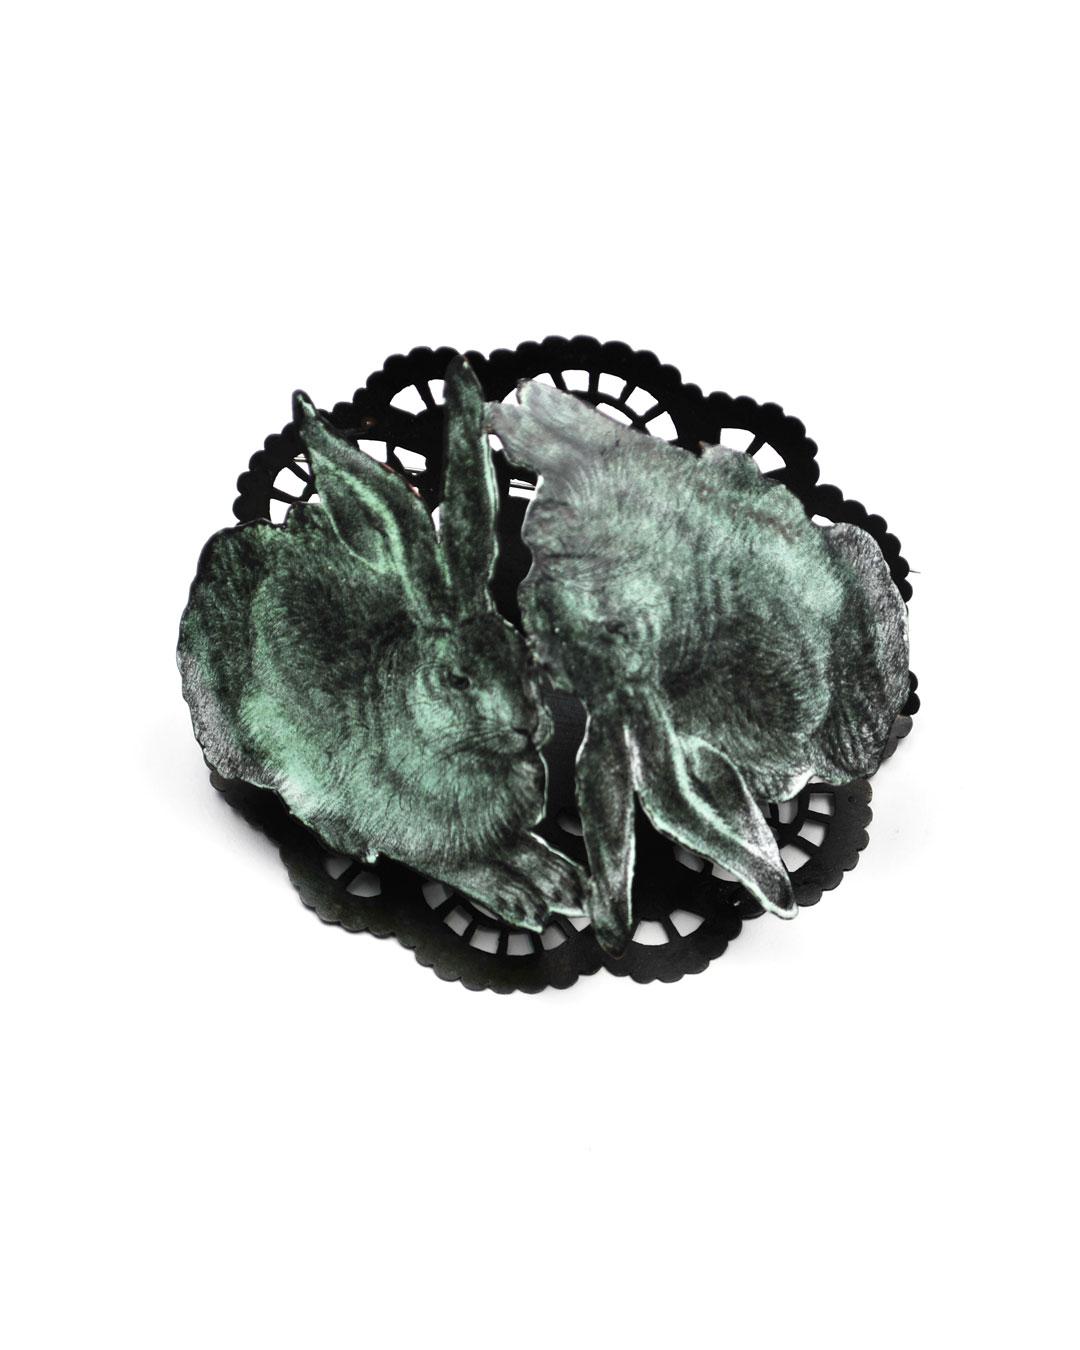 Vera Siemund, untitled, 2015, brooch; enamelled copper, steel, silver, 98 x 80 x 55 mm, €950